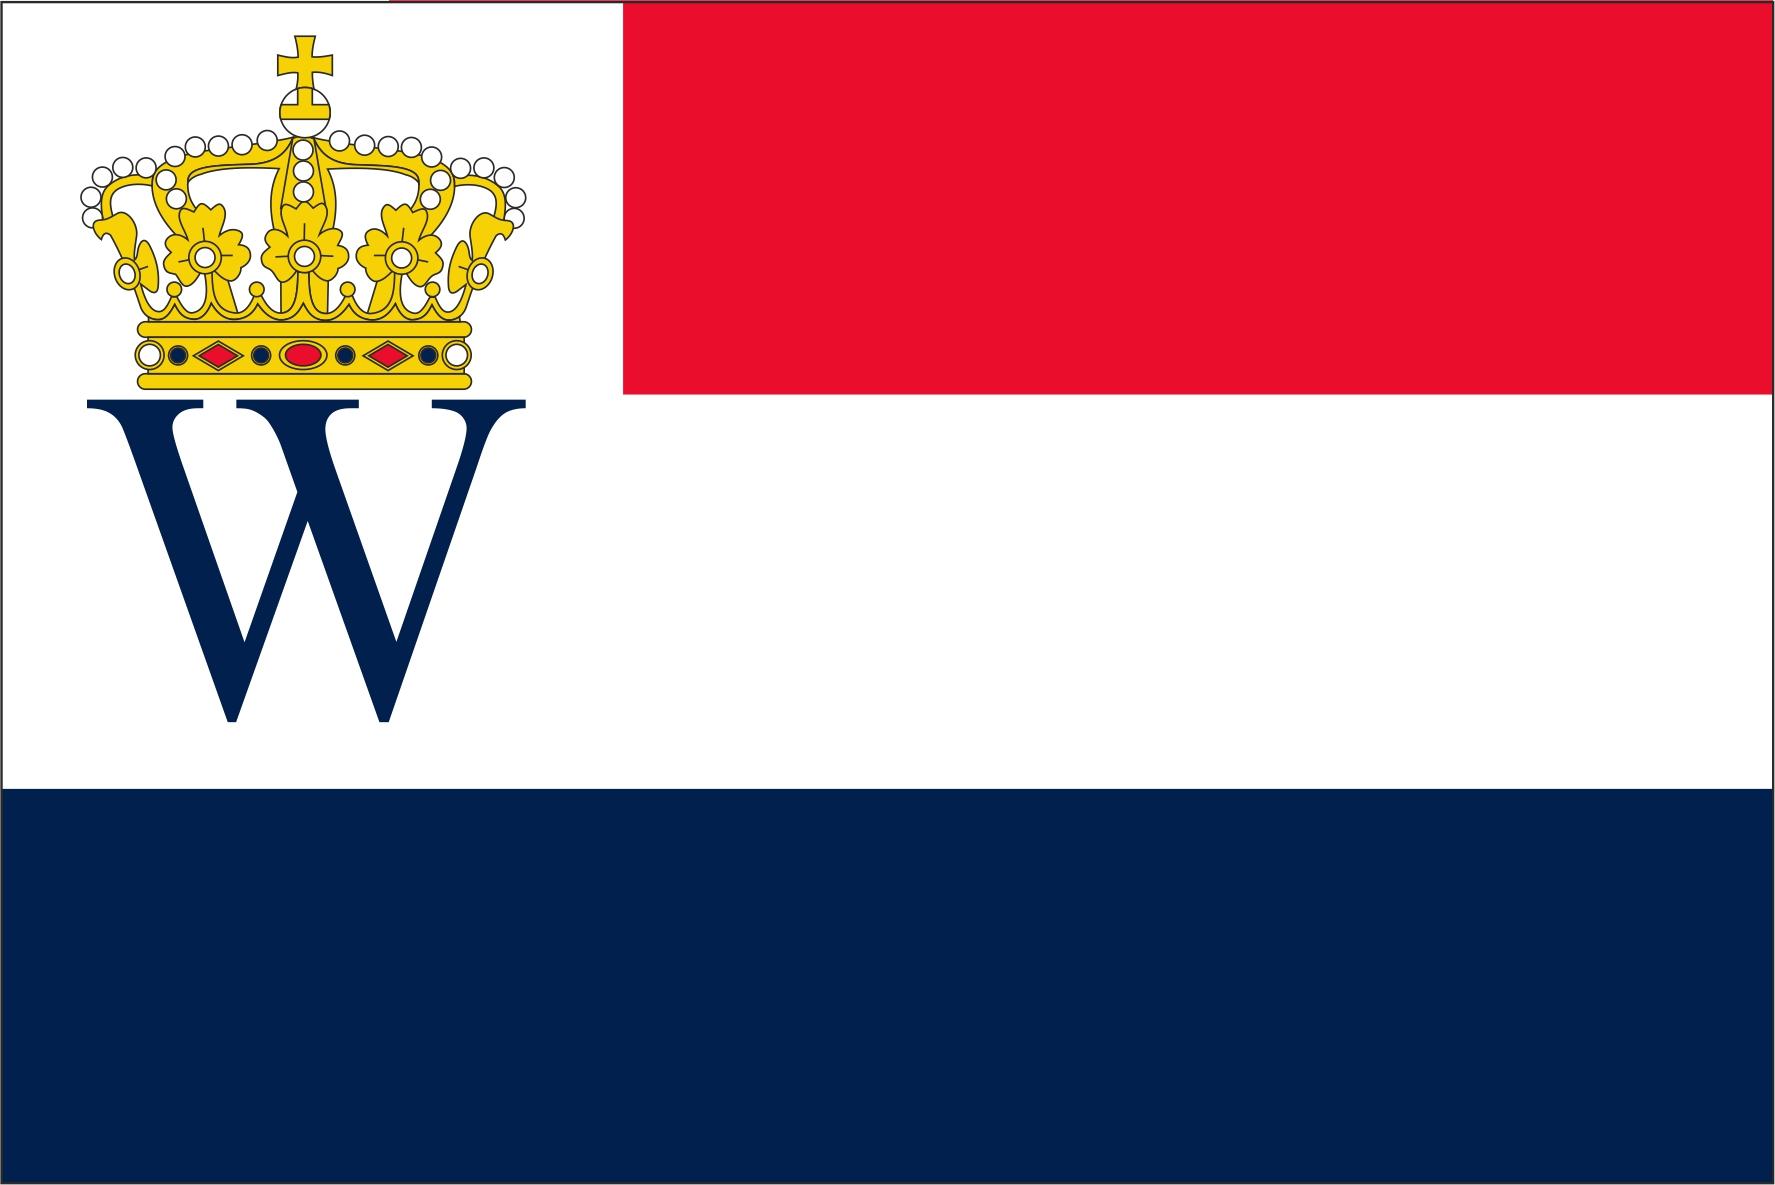 Koninklijke Watersport Vlag 150x225cm Oud hollands Marineblauw